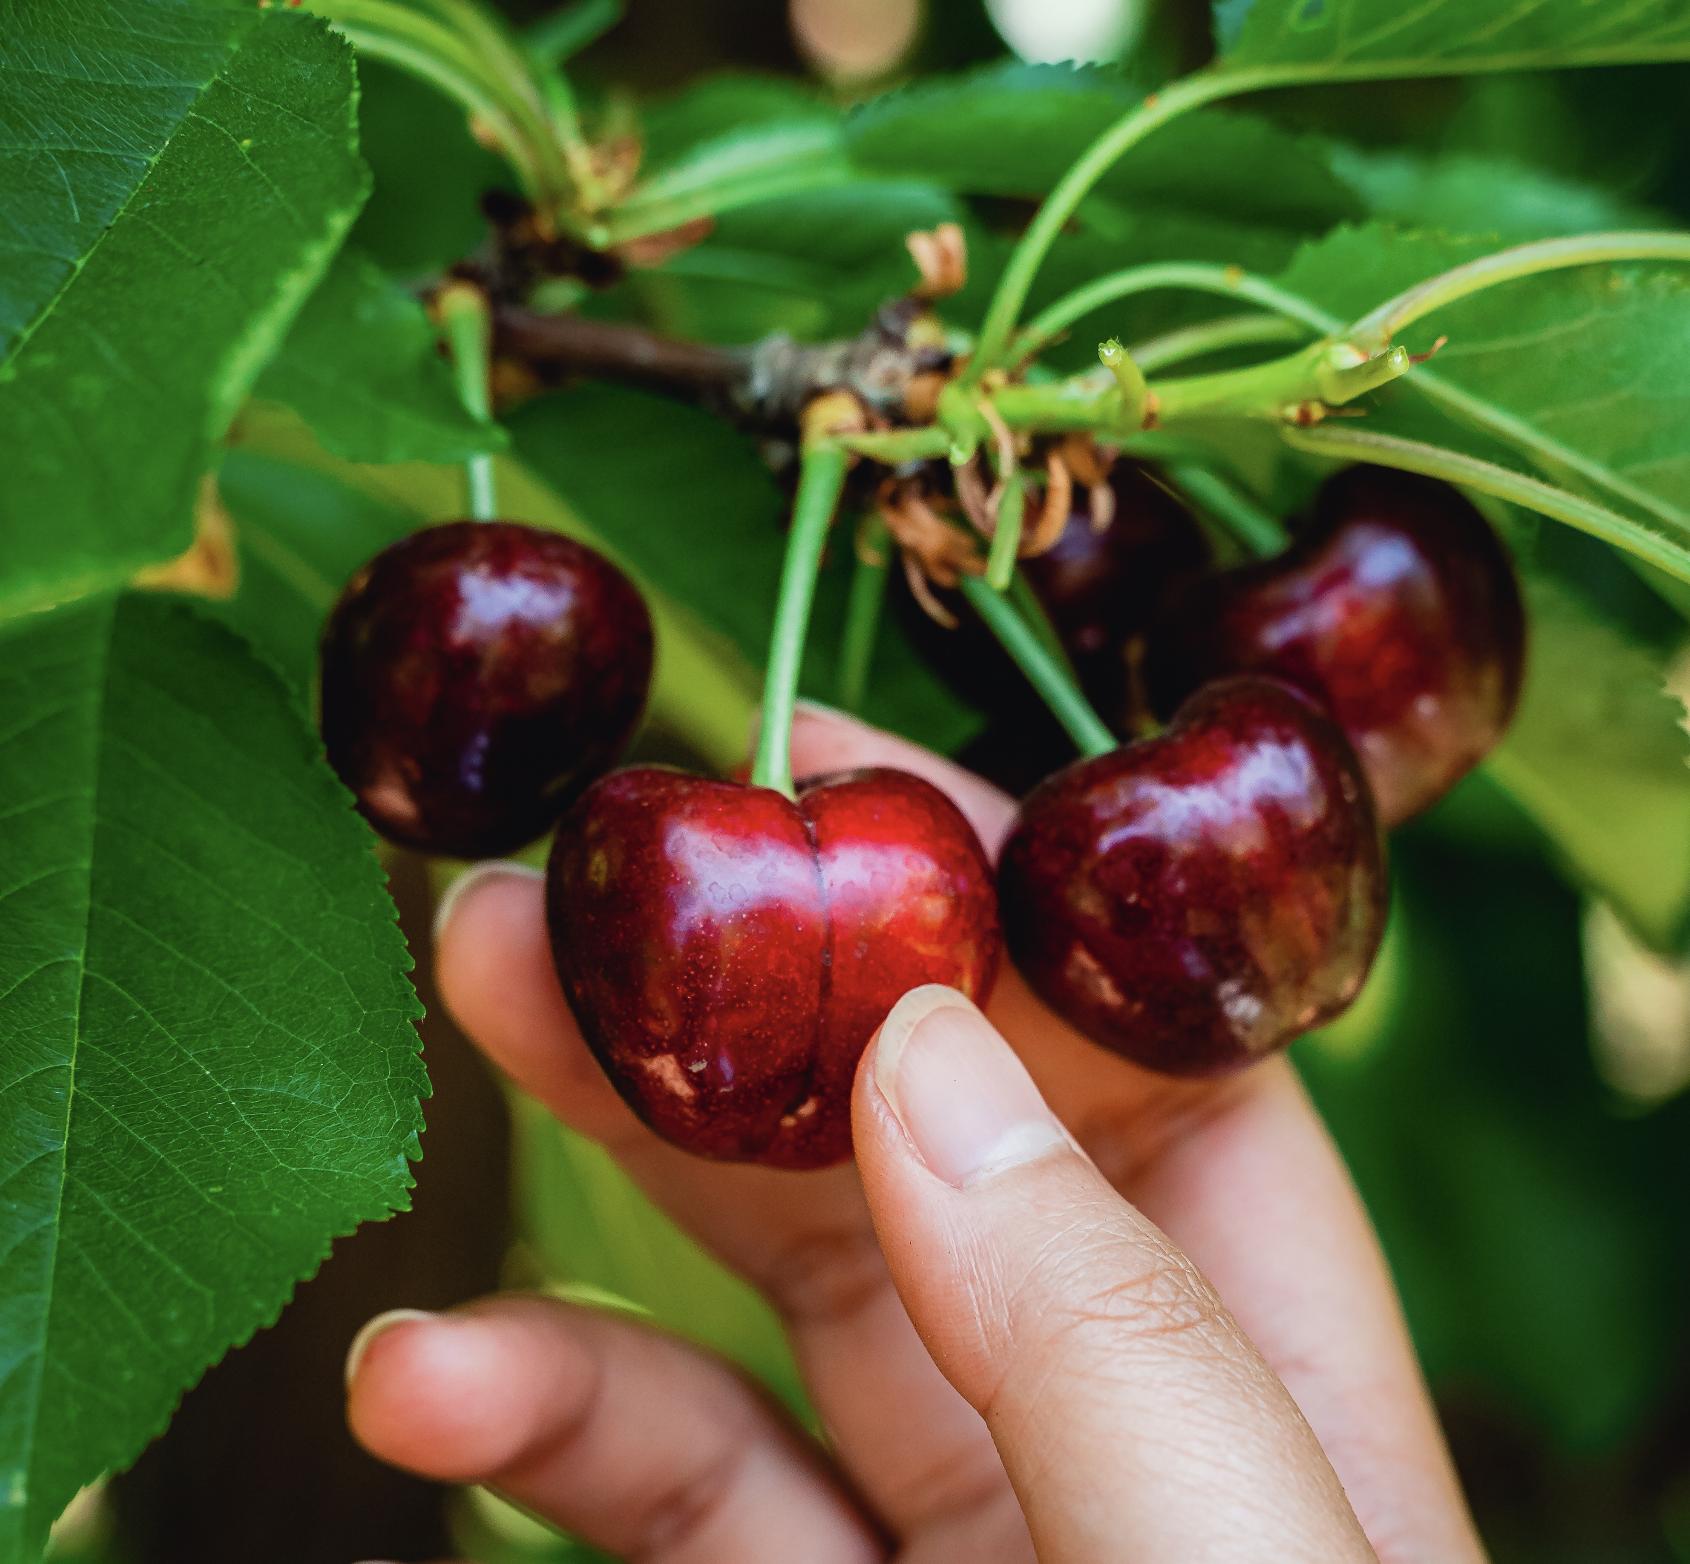 Harvest Time - Cherry U-Pick